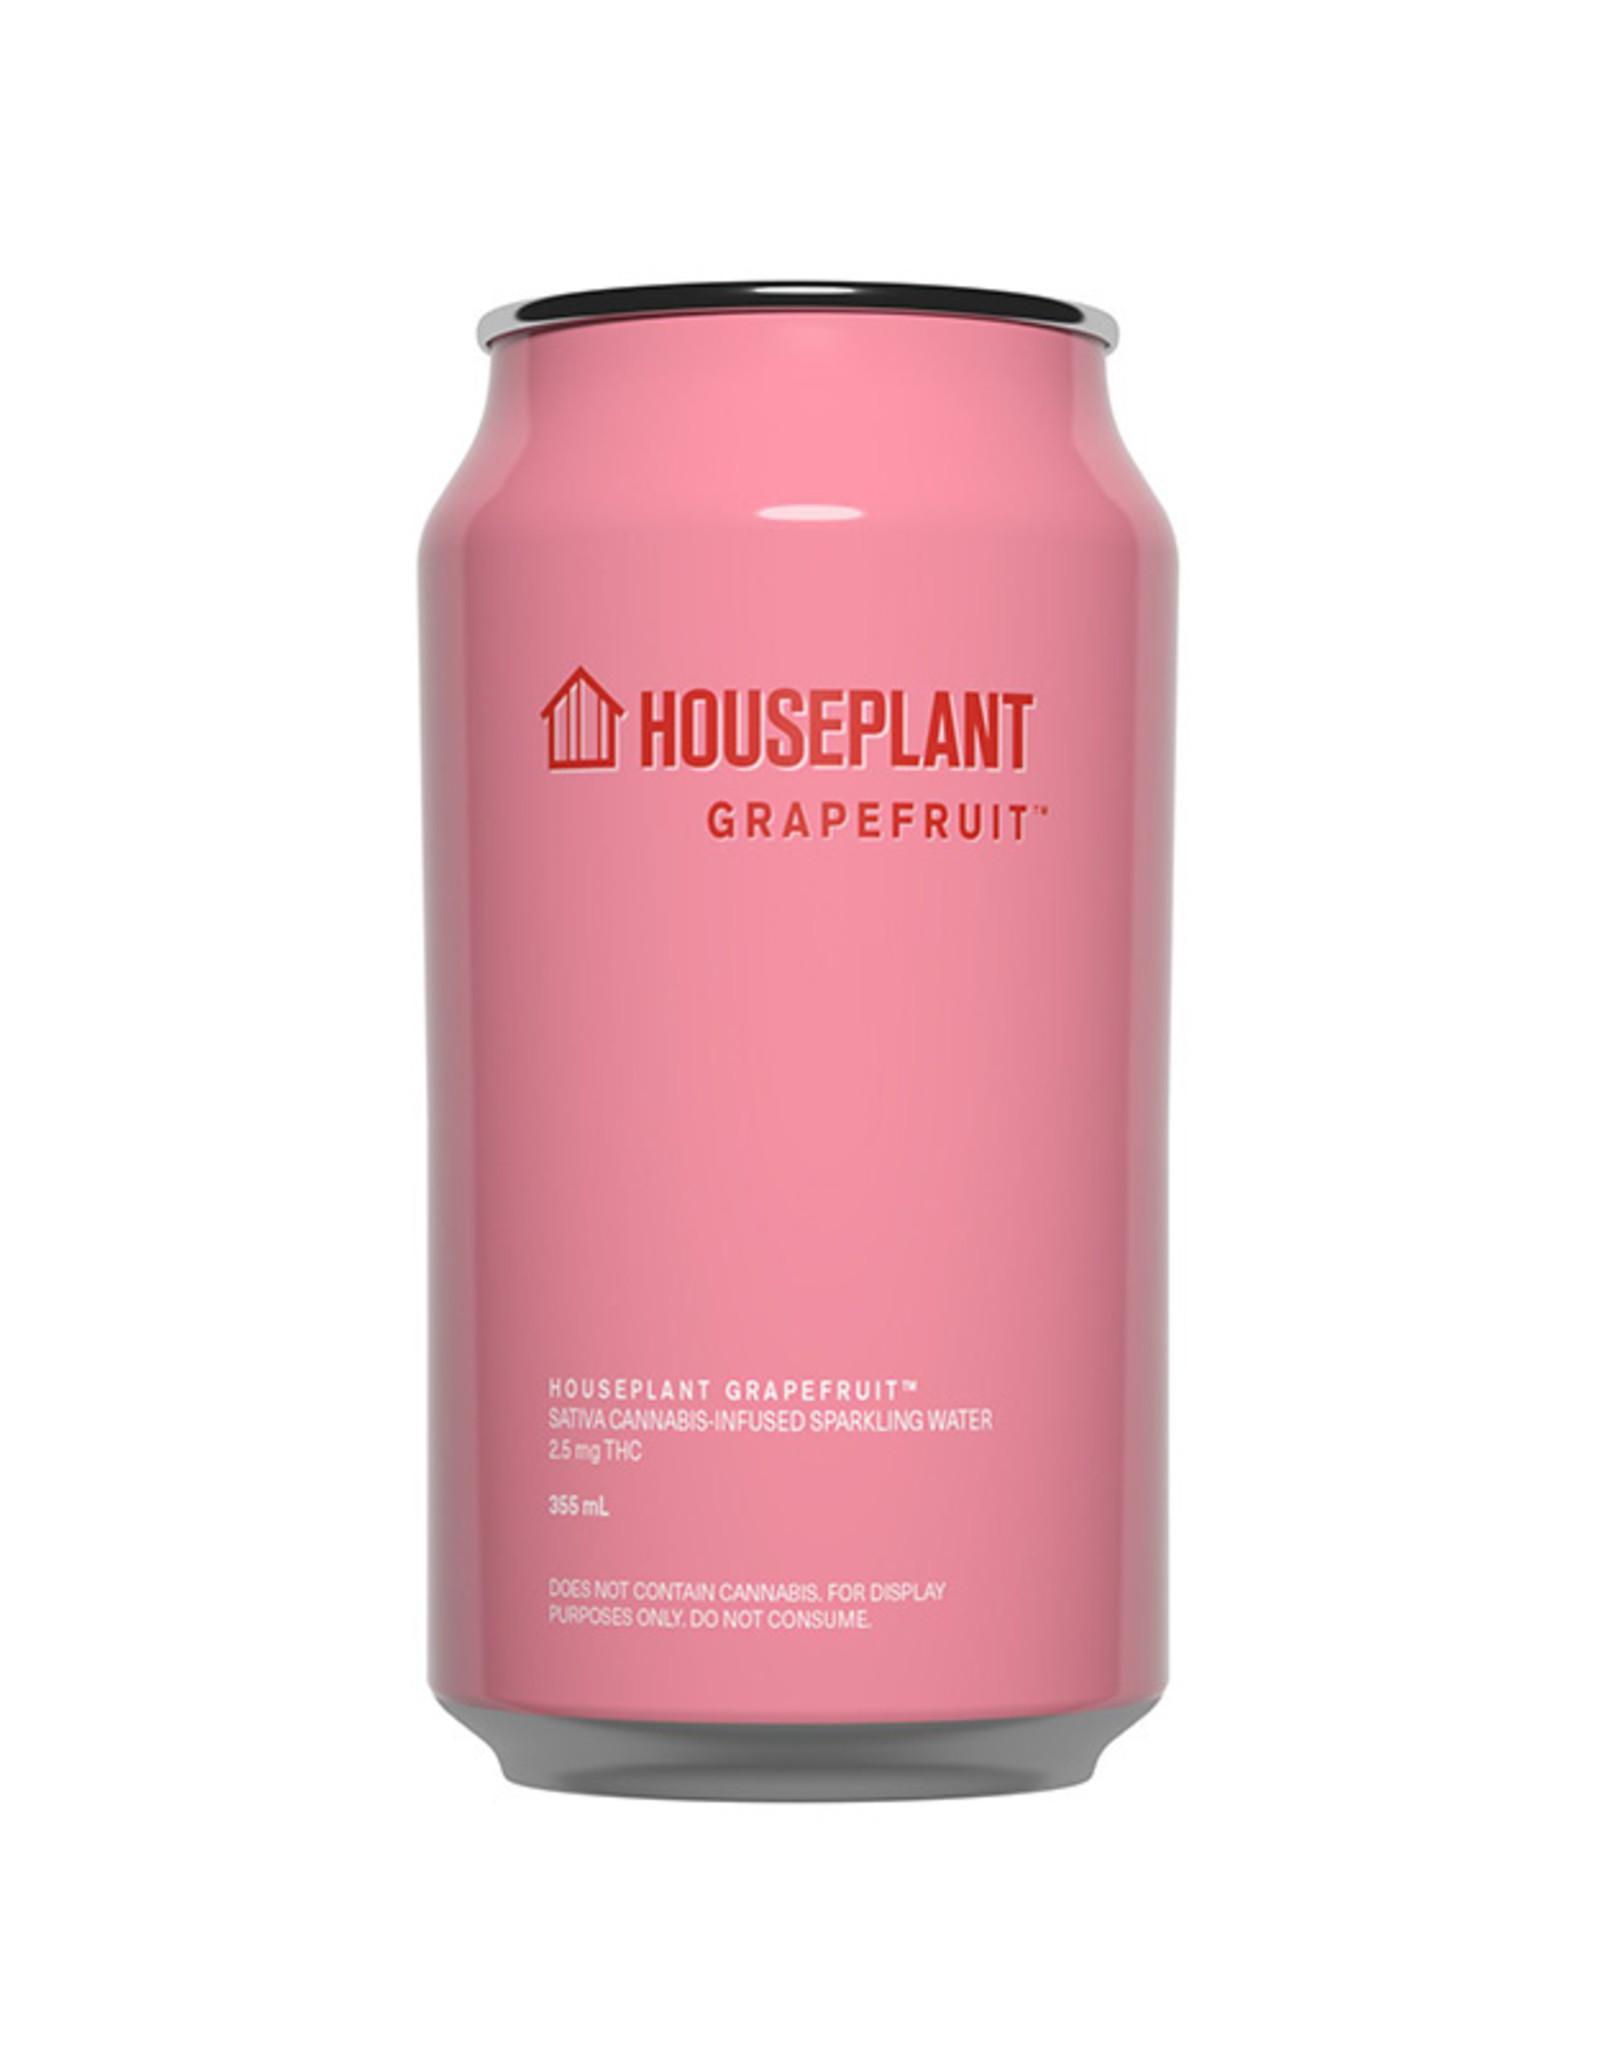 Houseplant Houseplant - Grapefruit Sparkling Water